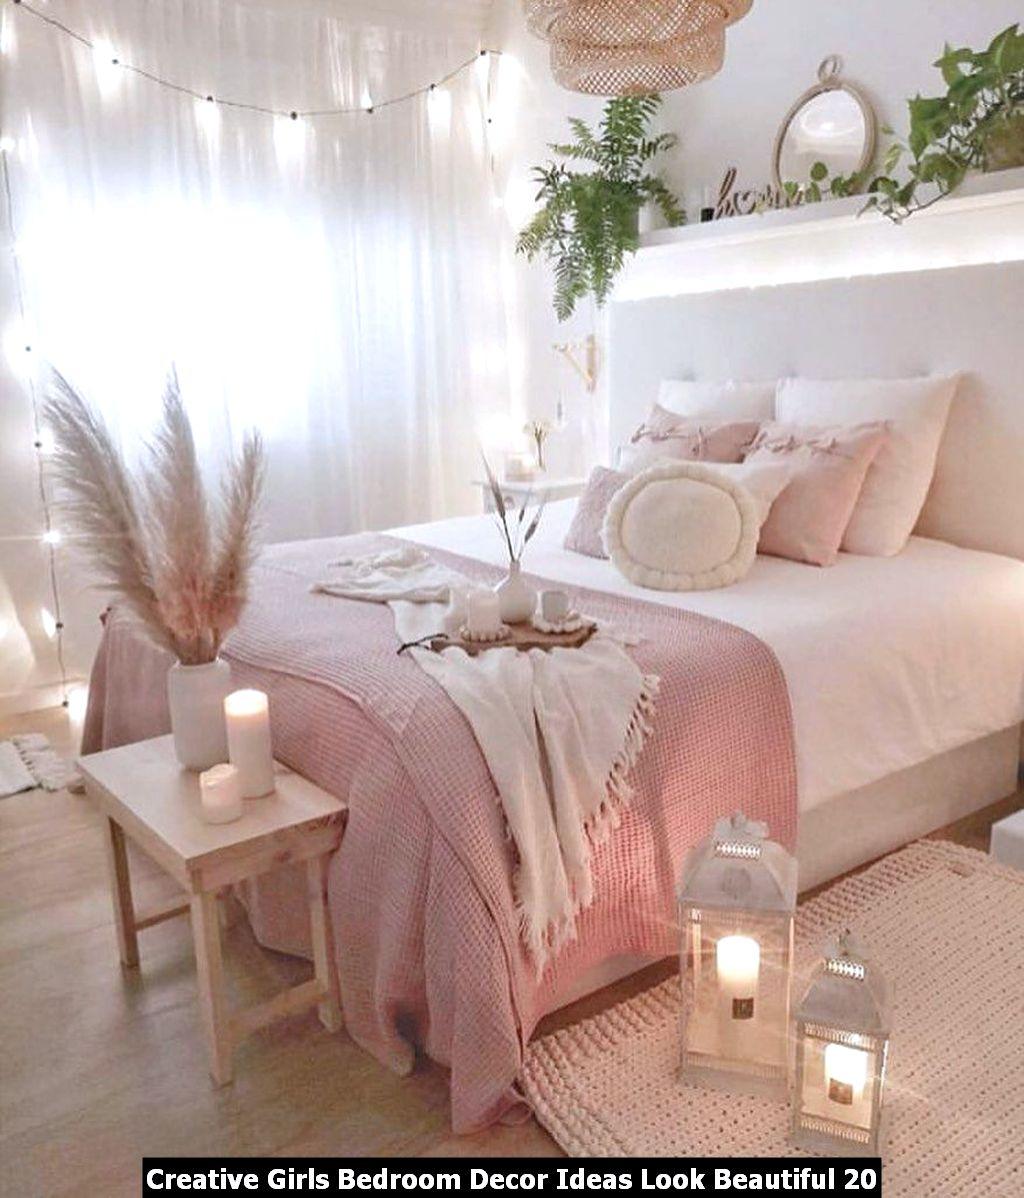 Creative Girls Bedroom Decor Ideas Look Beautiful 20